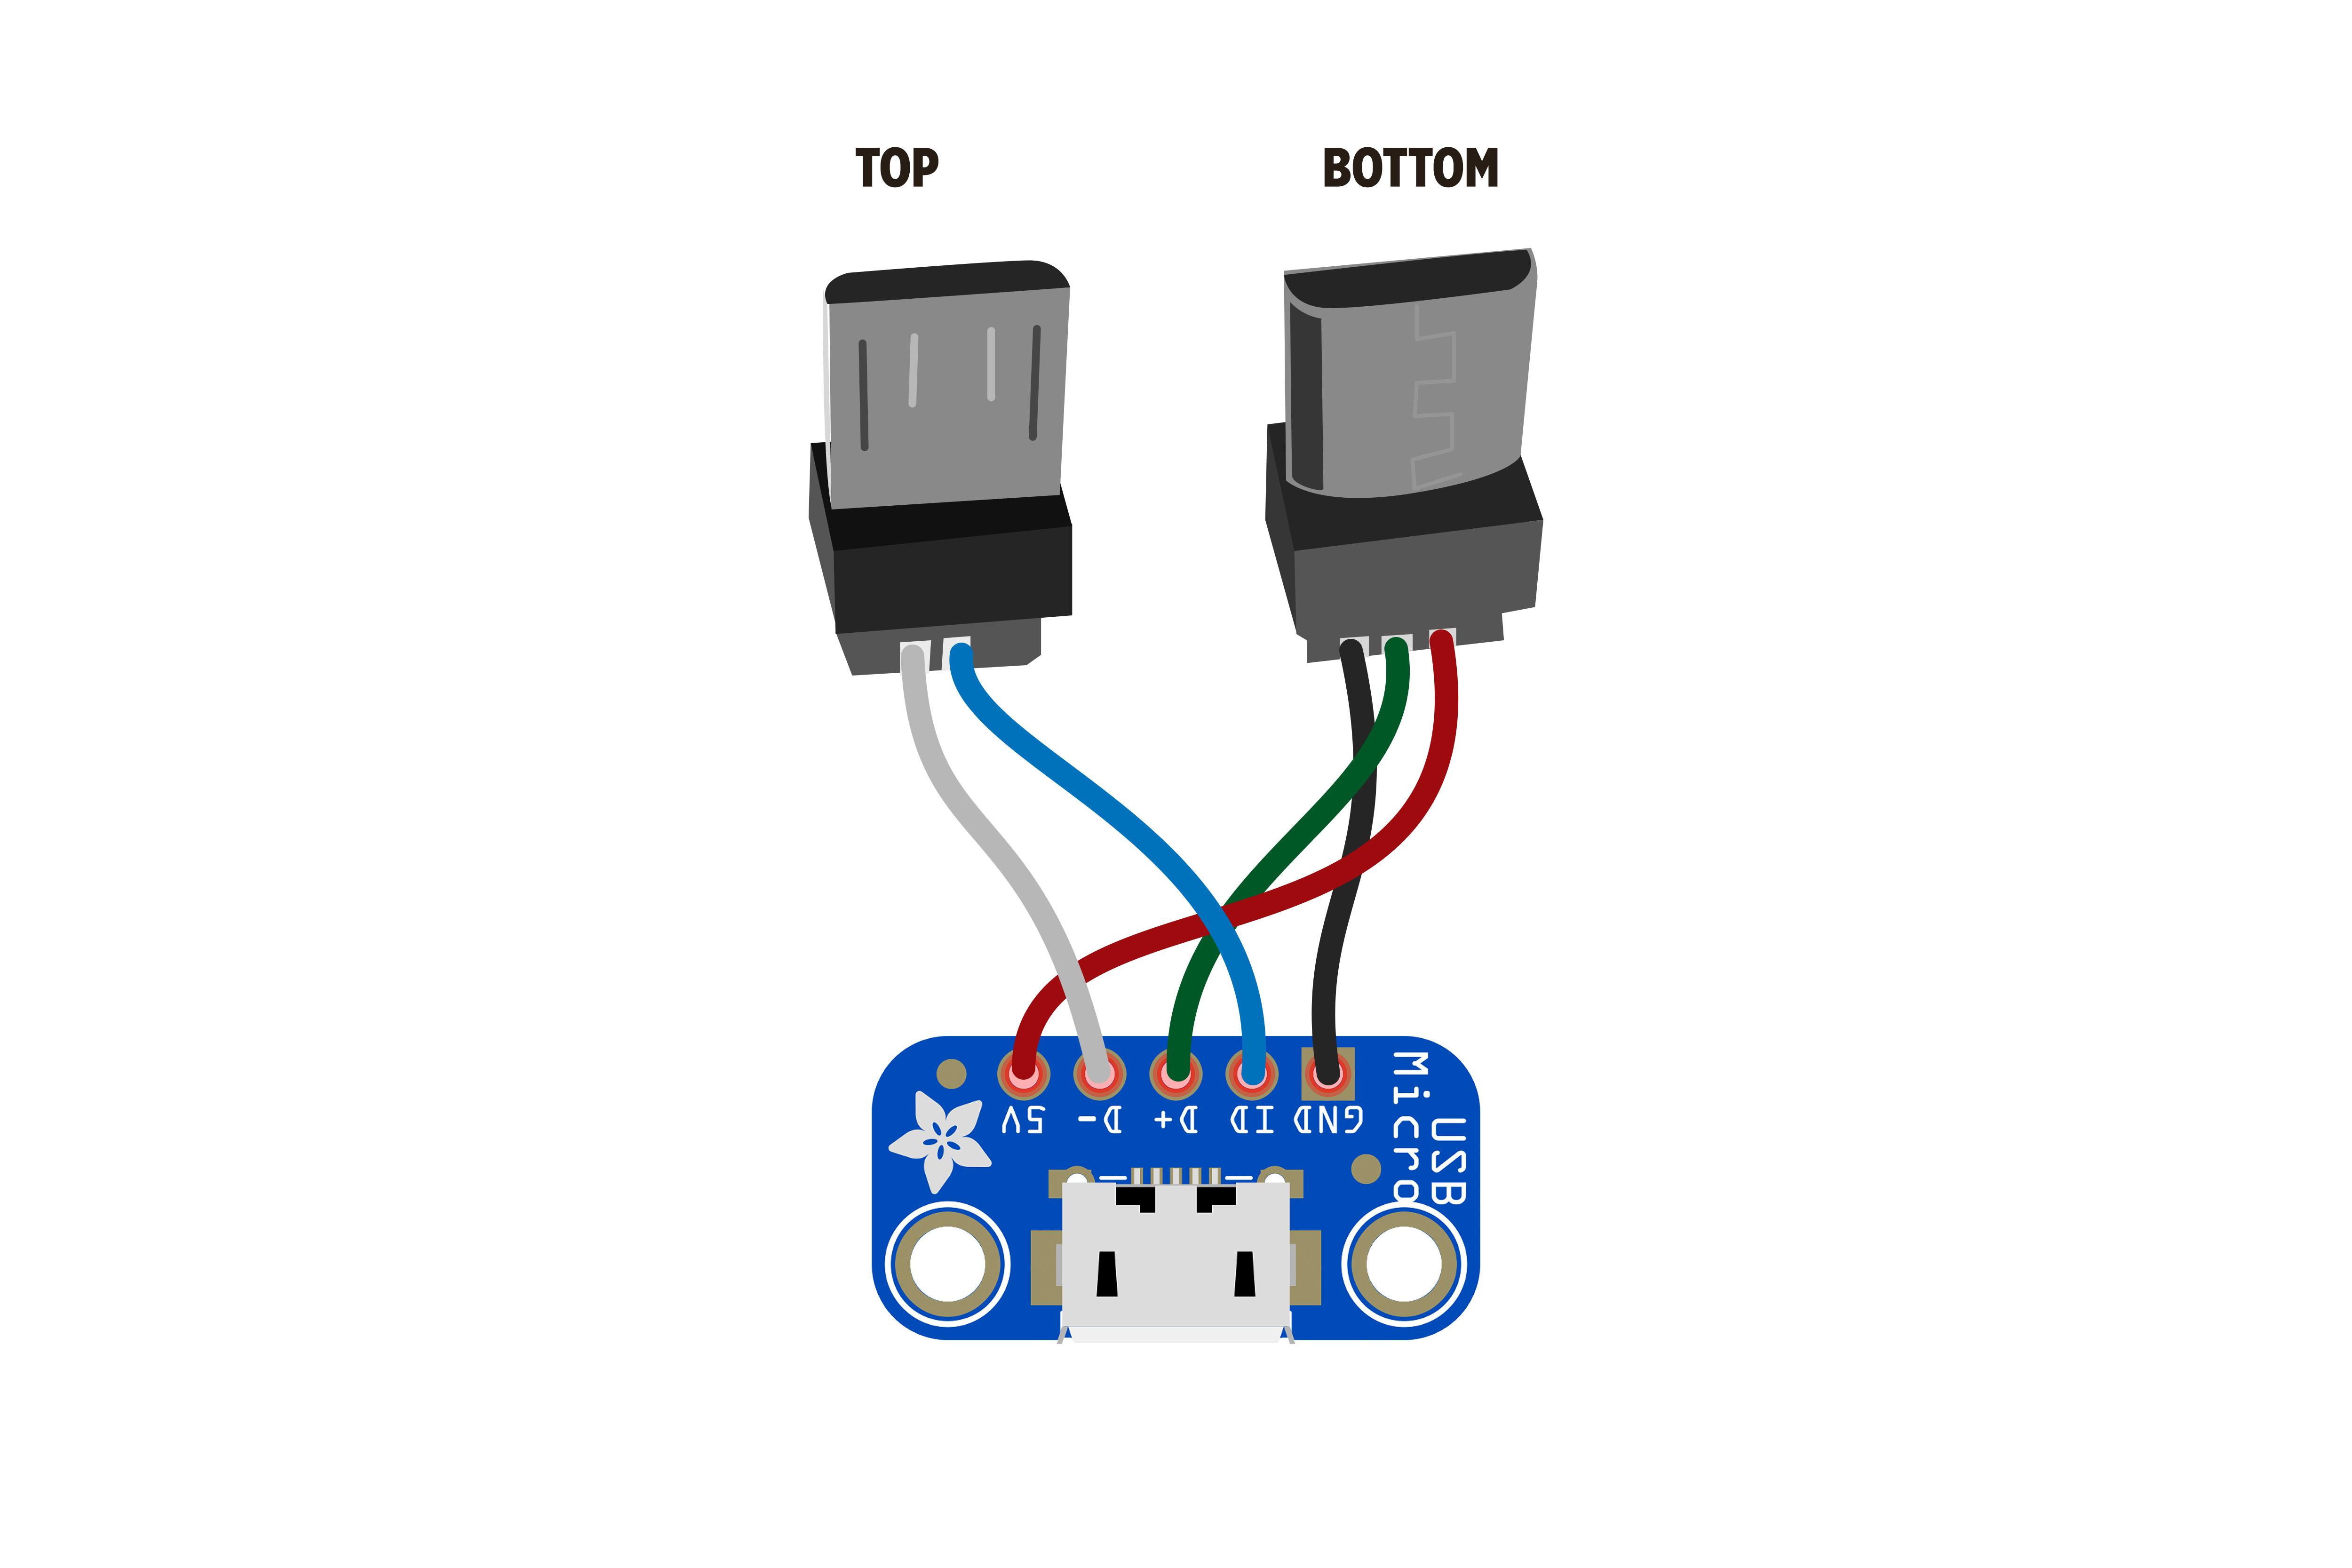 circuit_playground_circuit-diagram.jpg